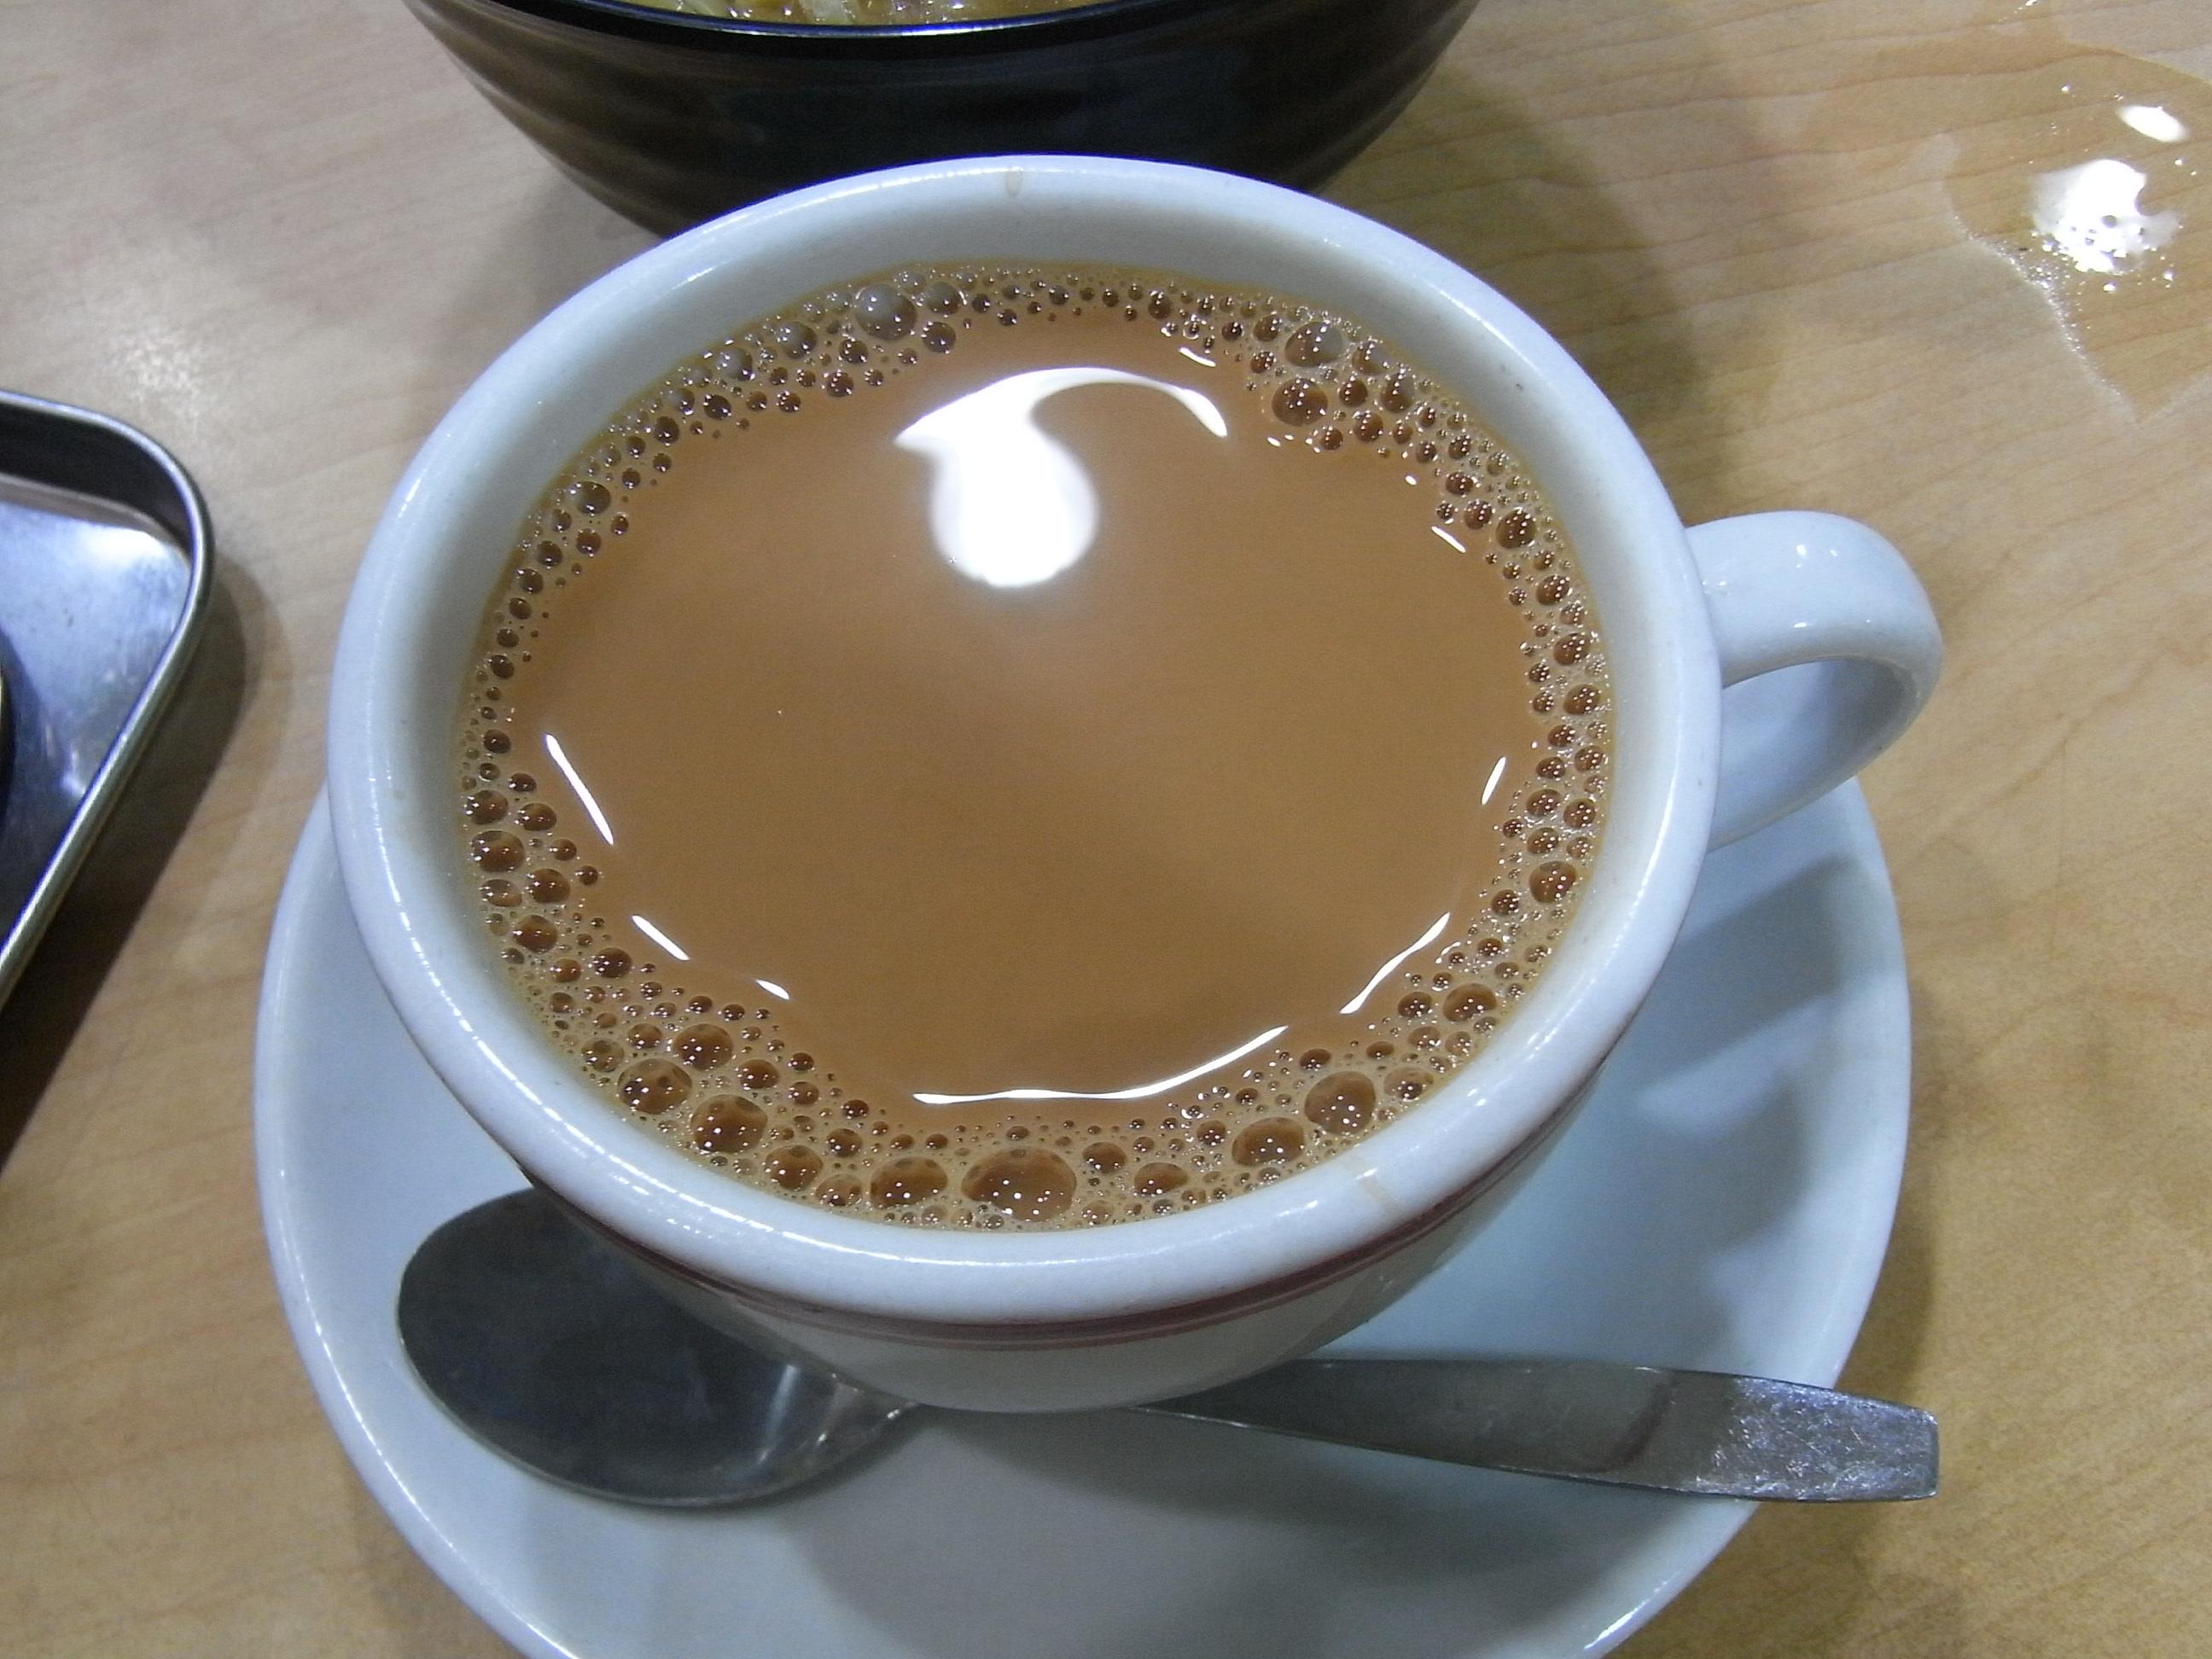 File:HK Sai Ying Pun Milk Tea cup tablespoon Aug-2012.JPG ...